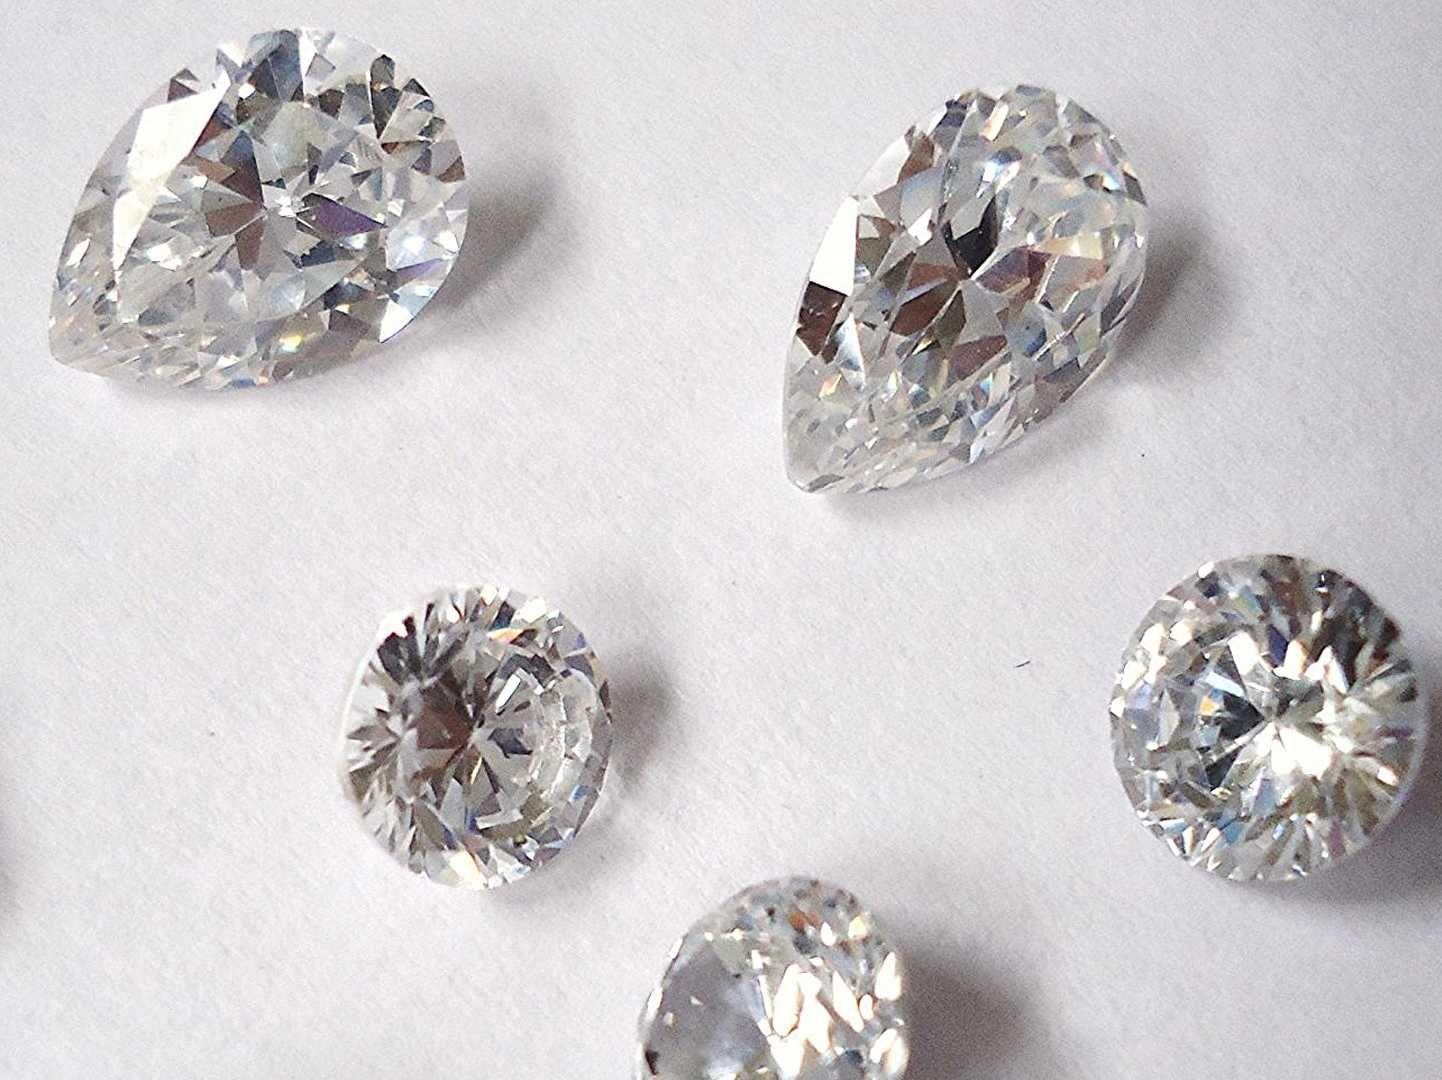 How To Tell If A Diamond Is Real Or Fake Diamond Fake Diamond Gemstones